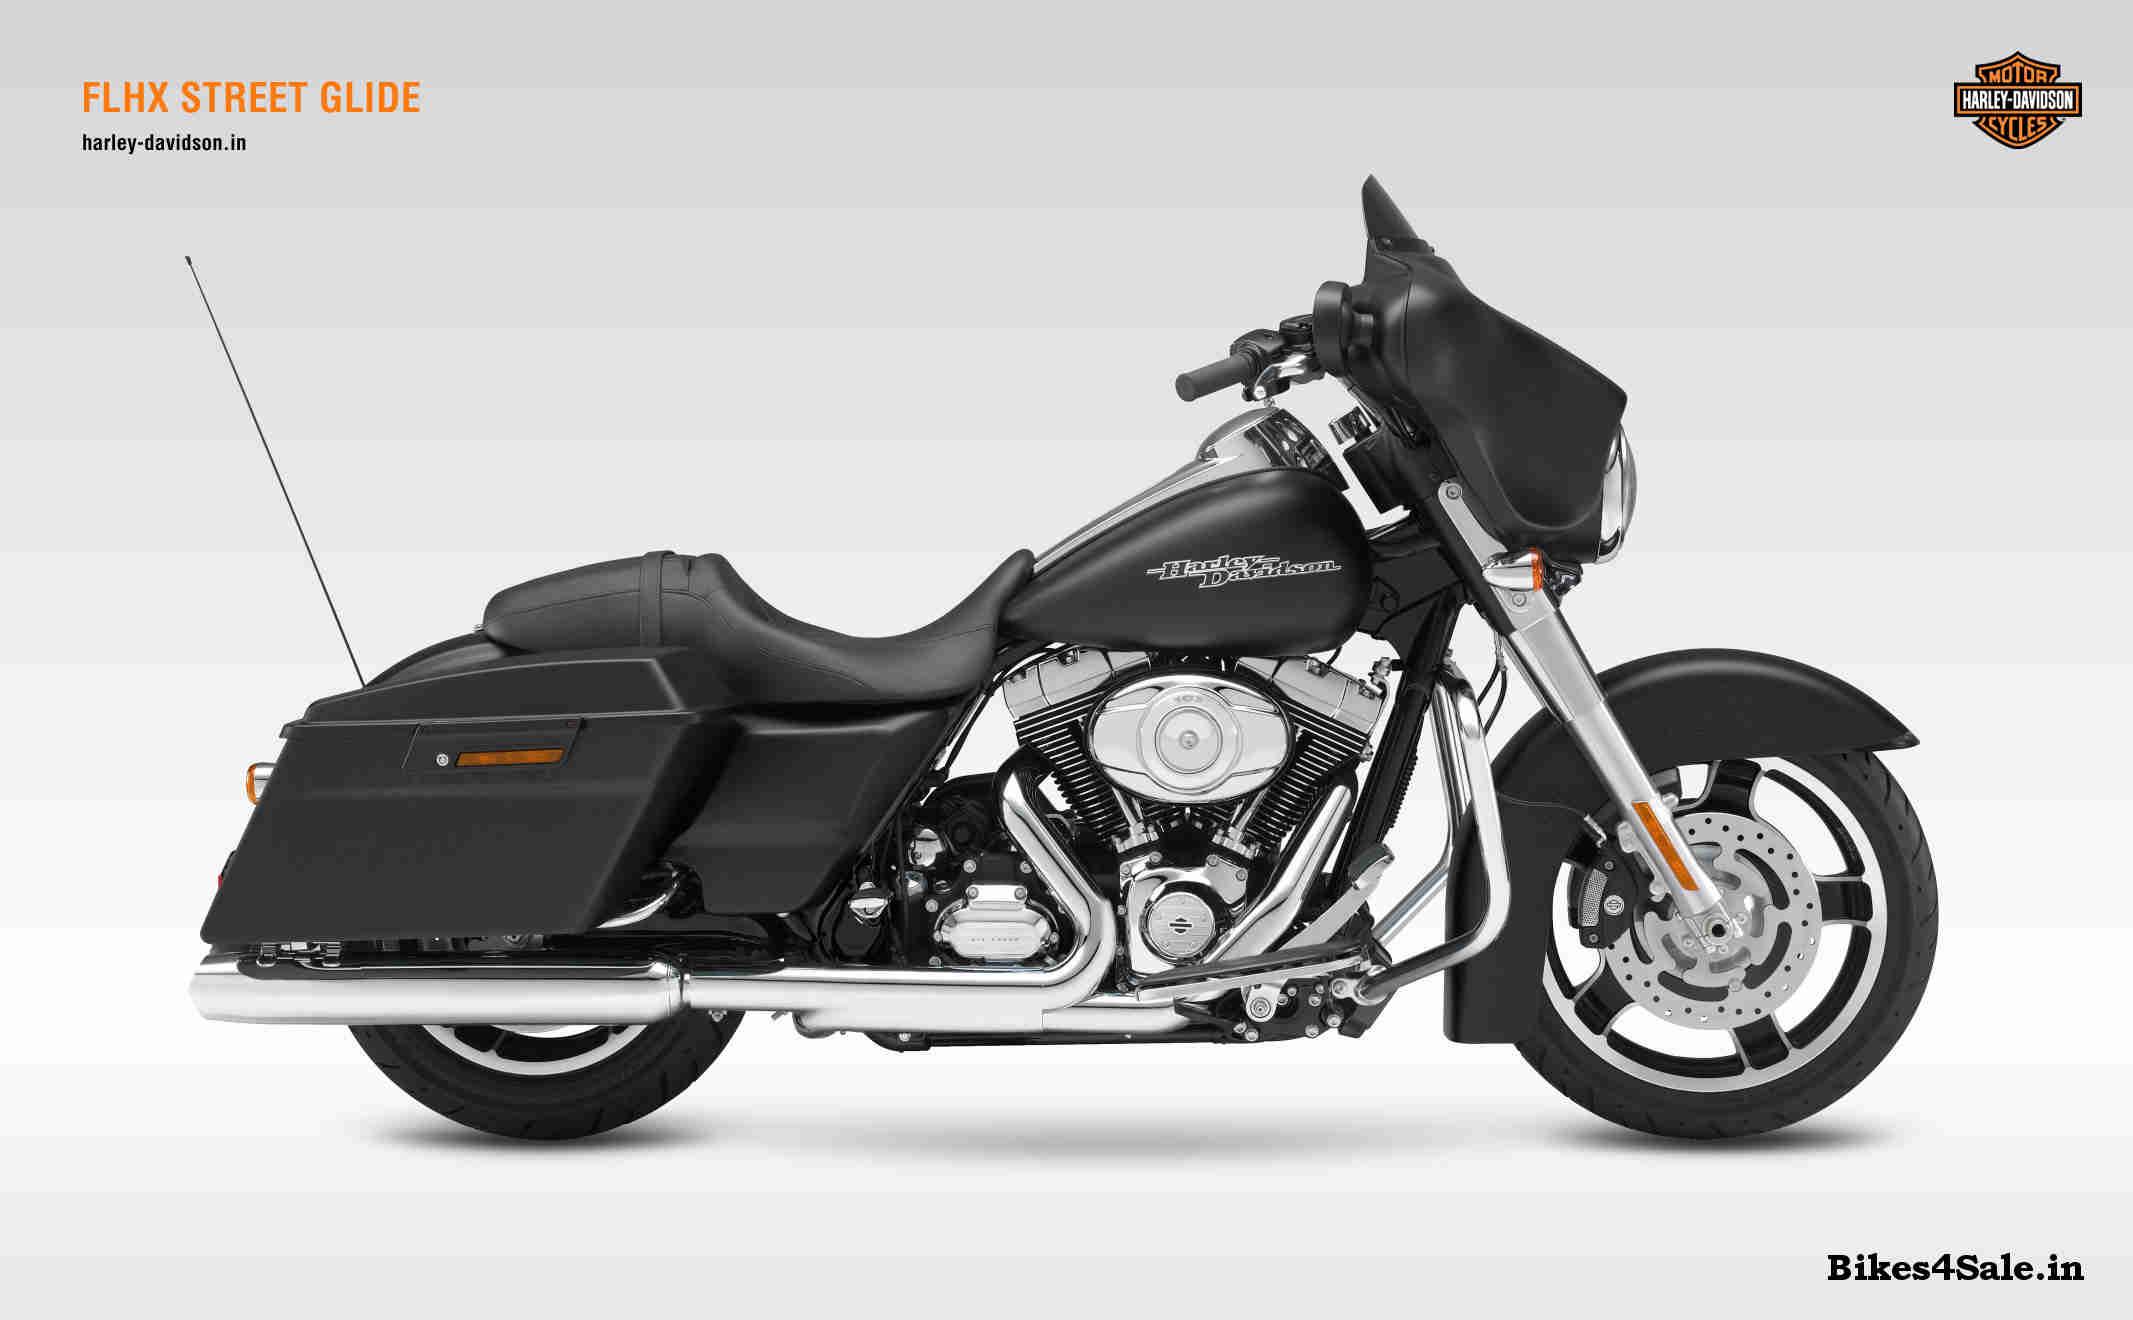 Harley Davidson Touring Flhx Street Glide Price Specs